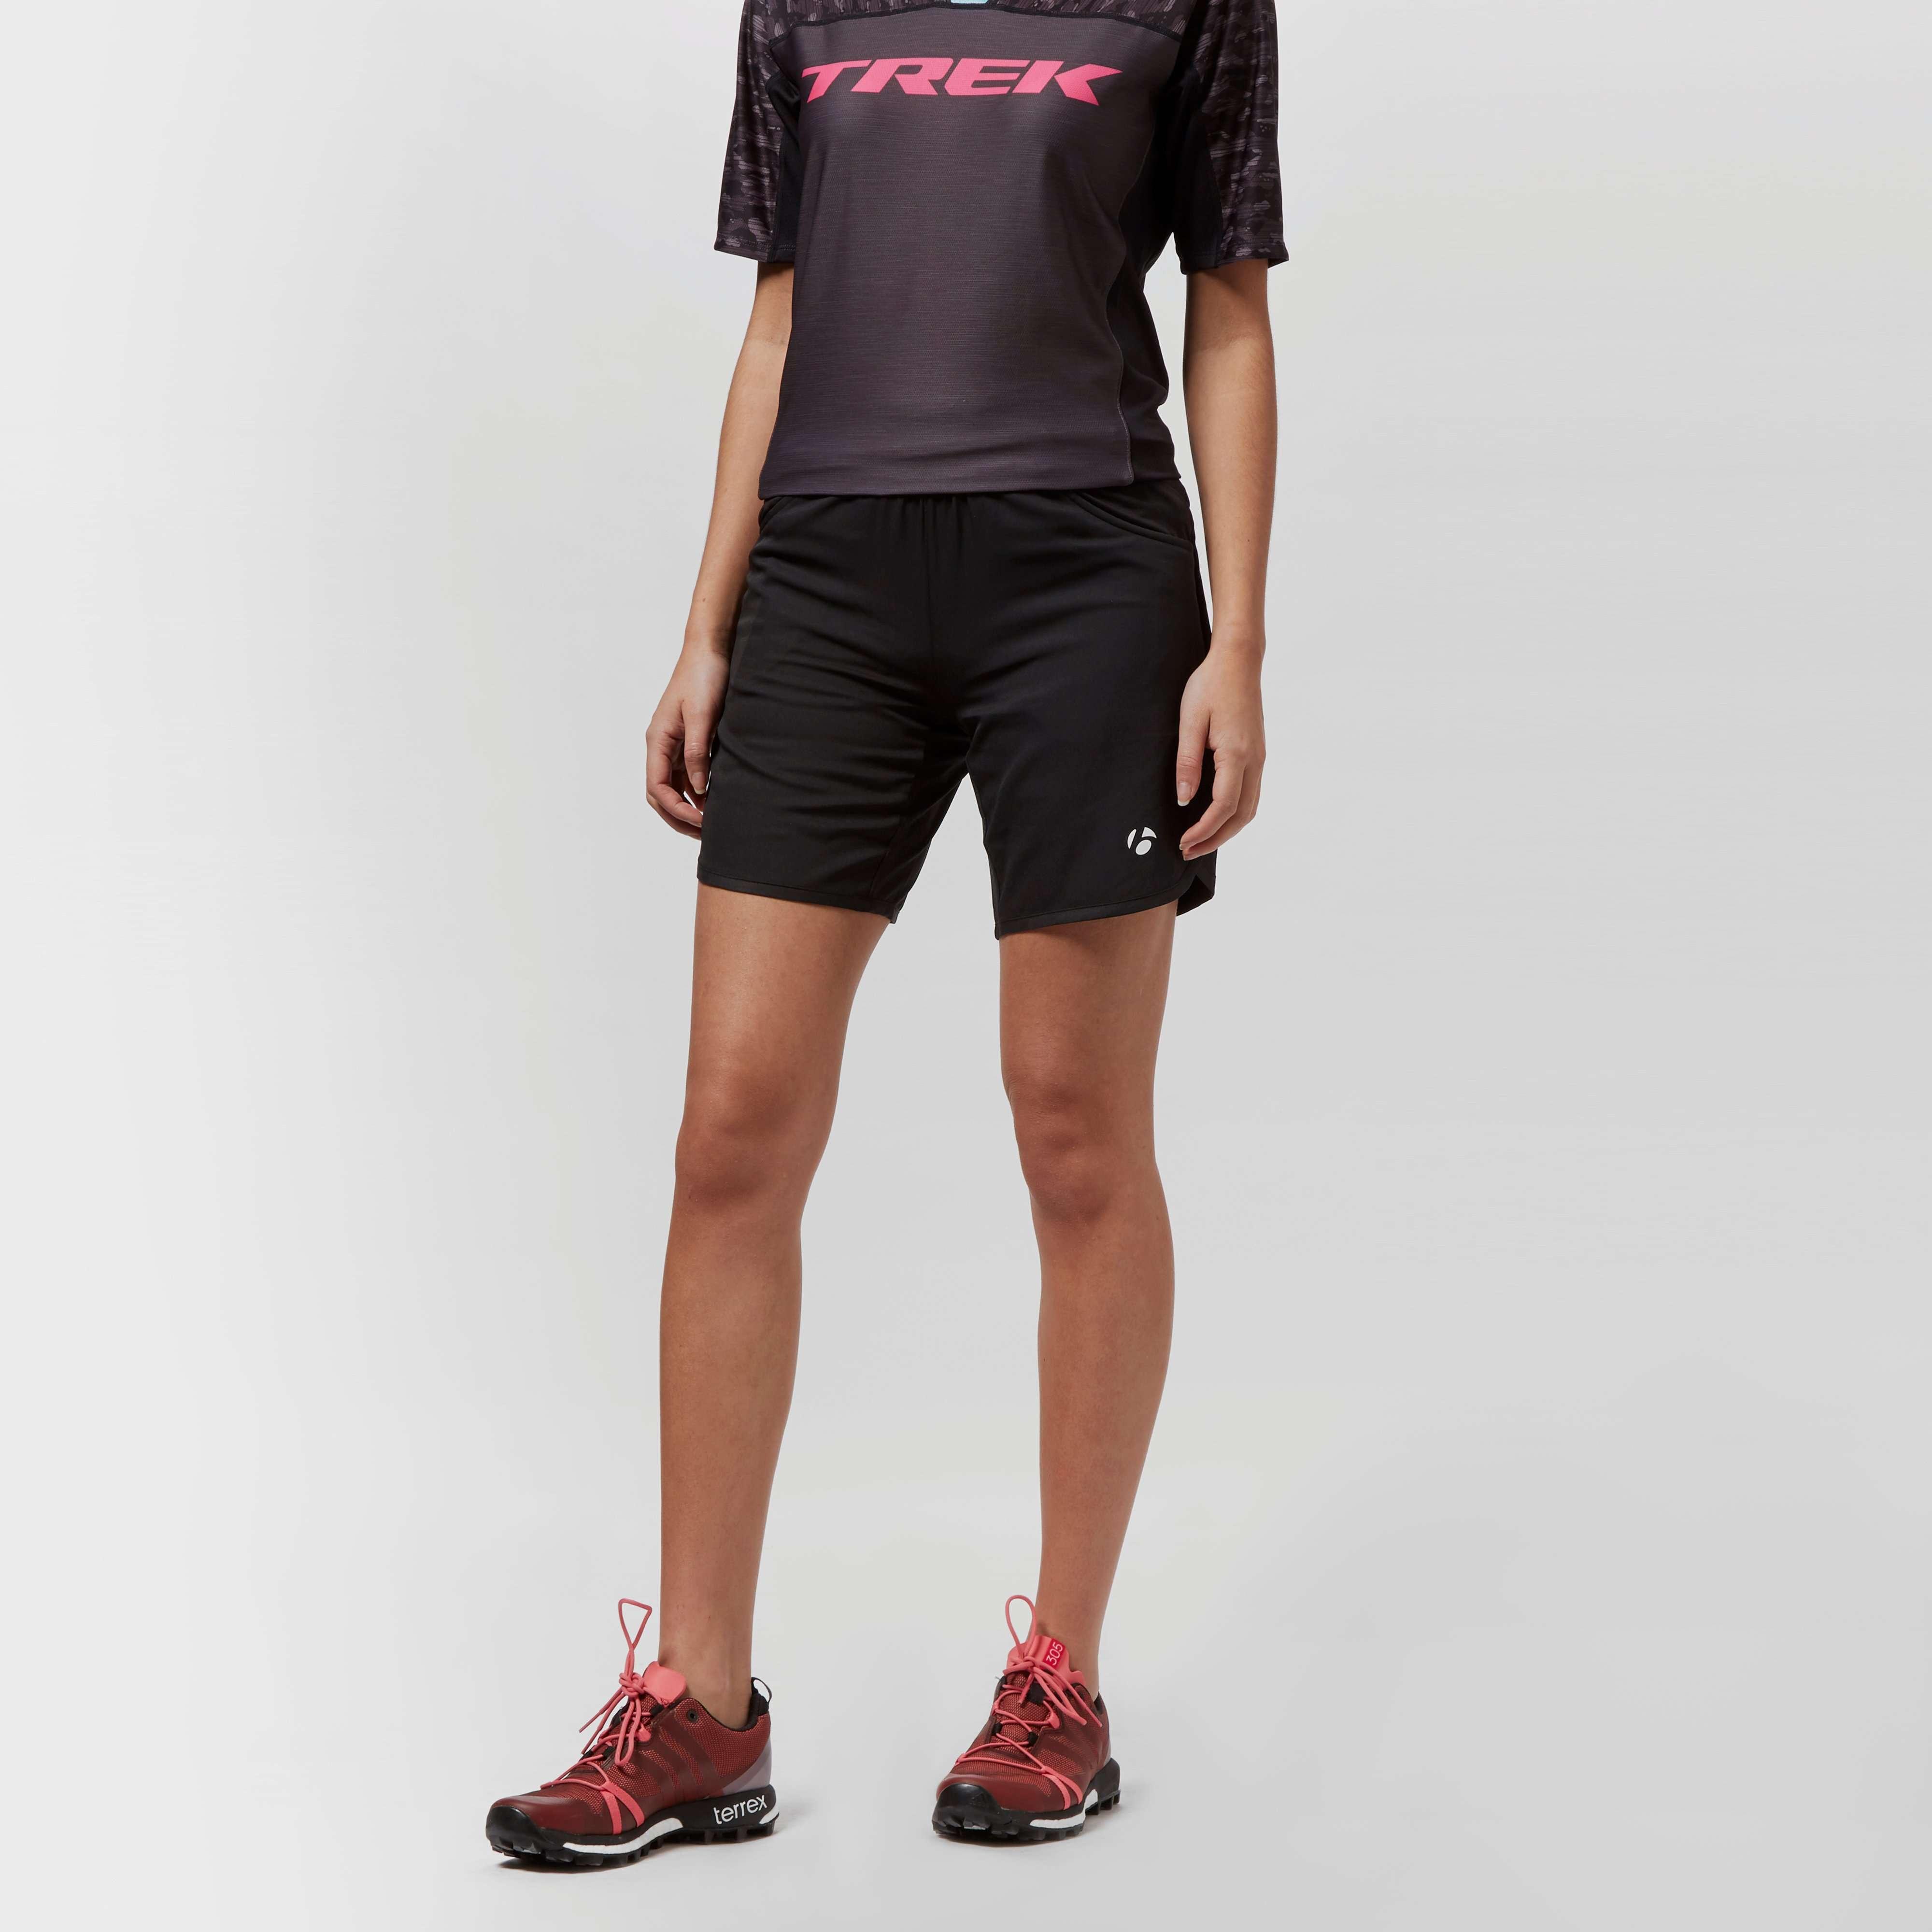 BONTRAGER Women's Kalia Cycle Shorts